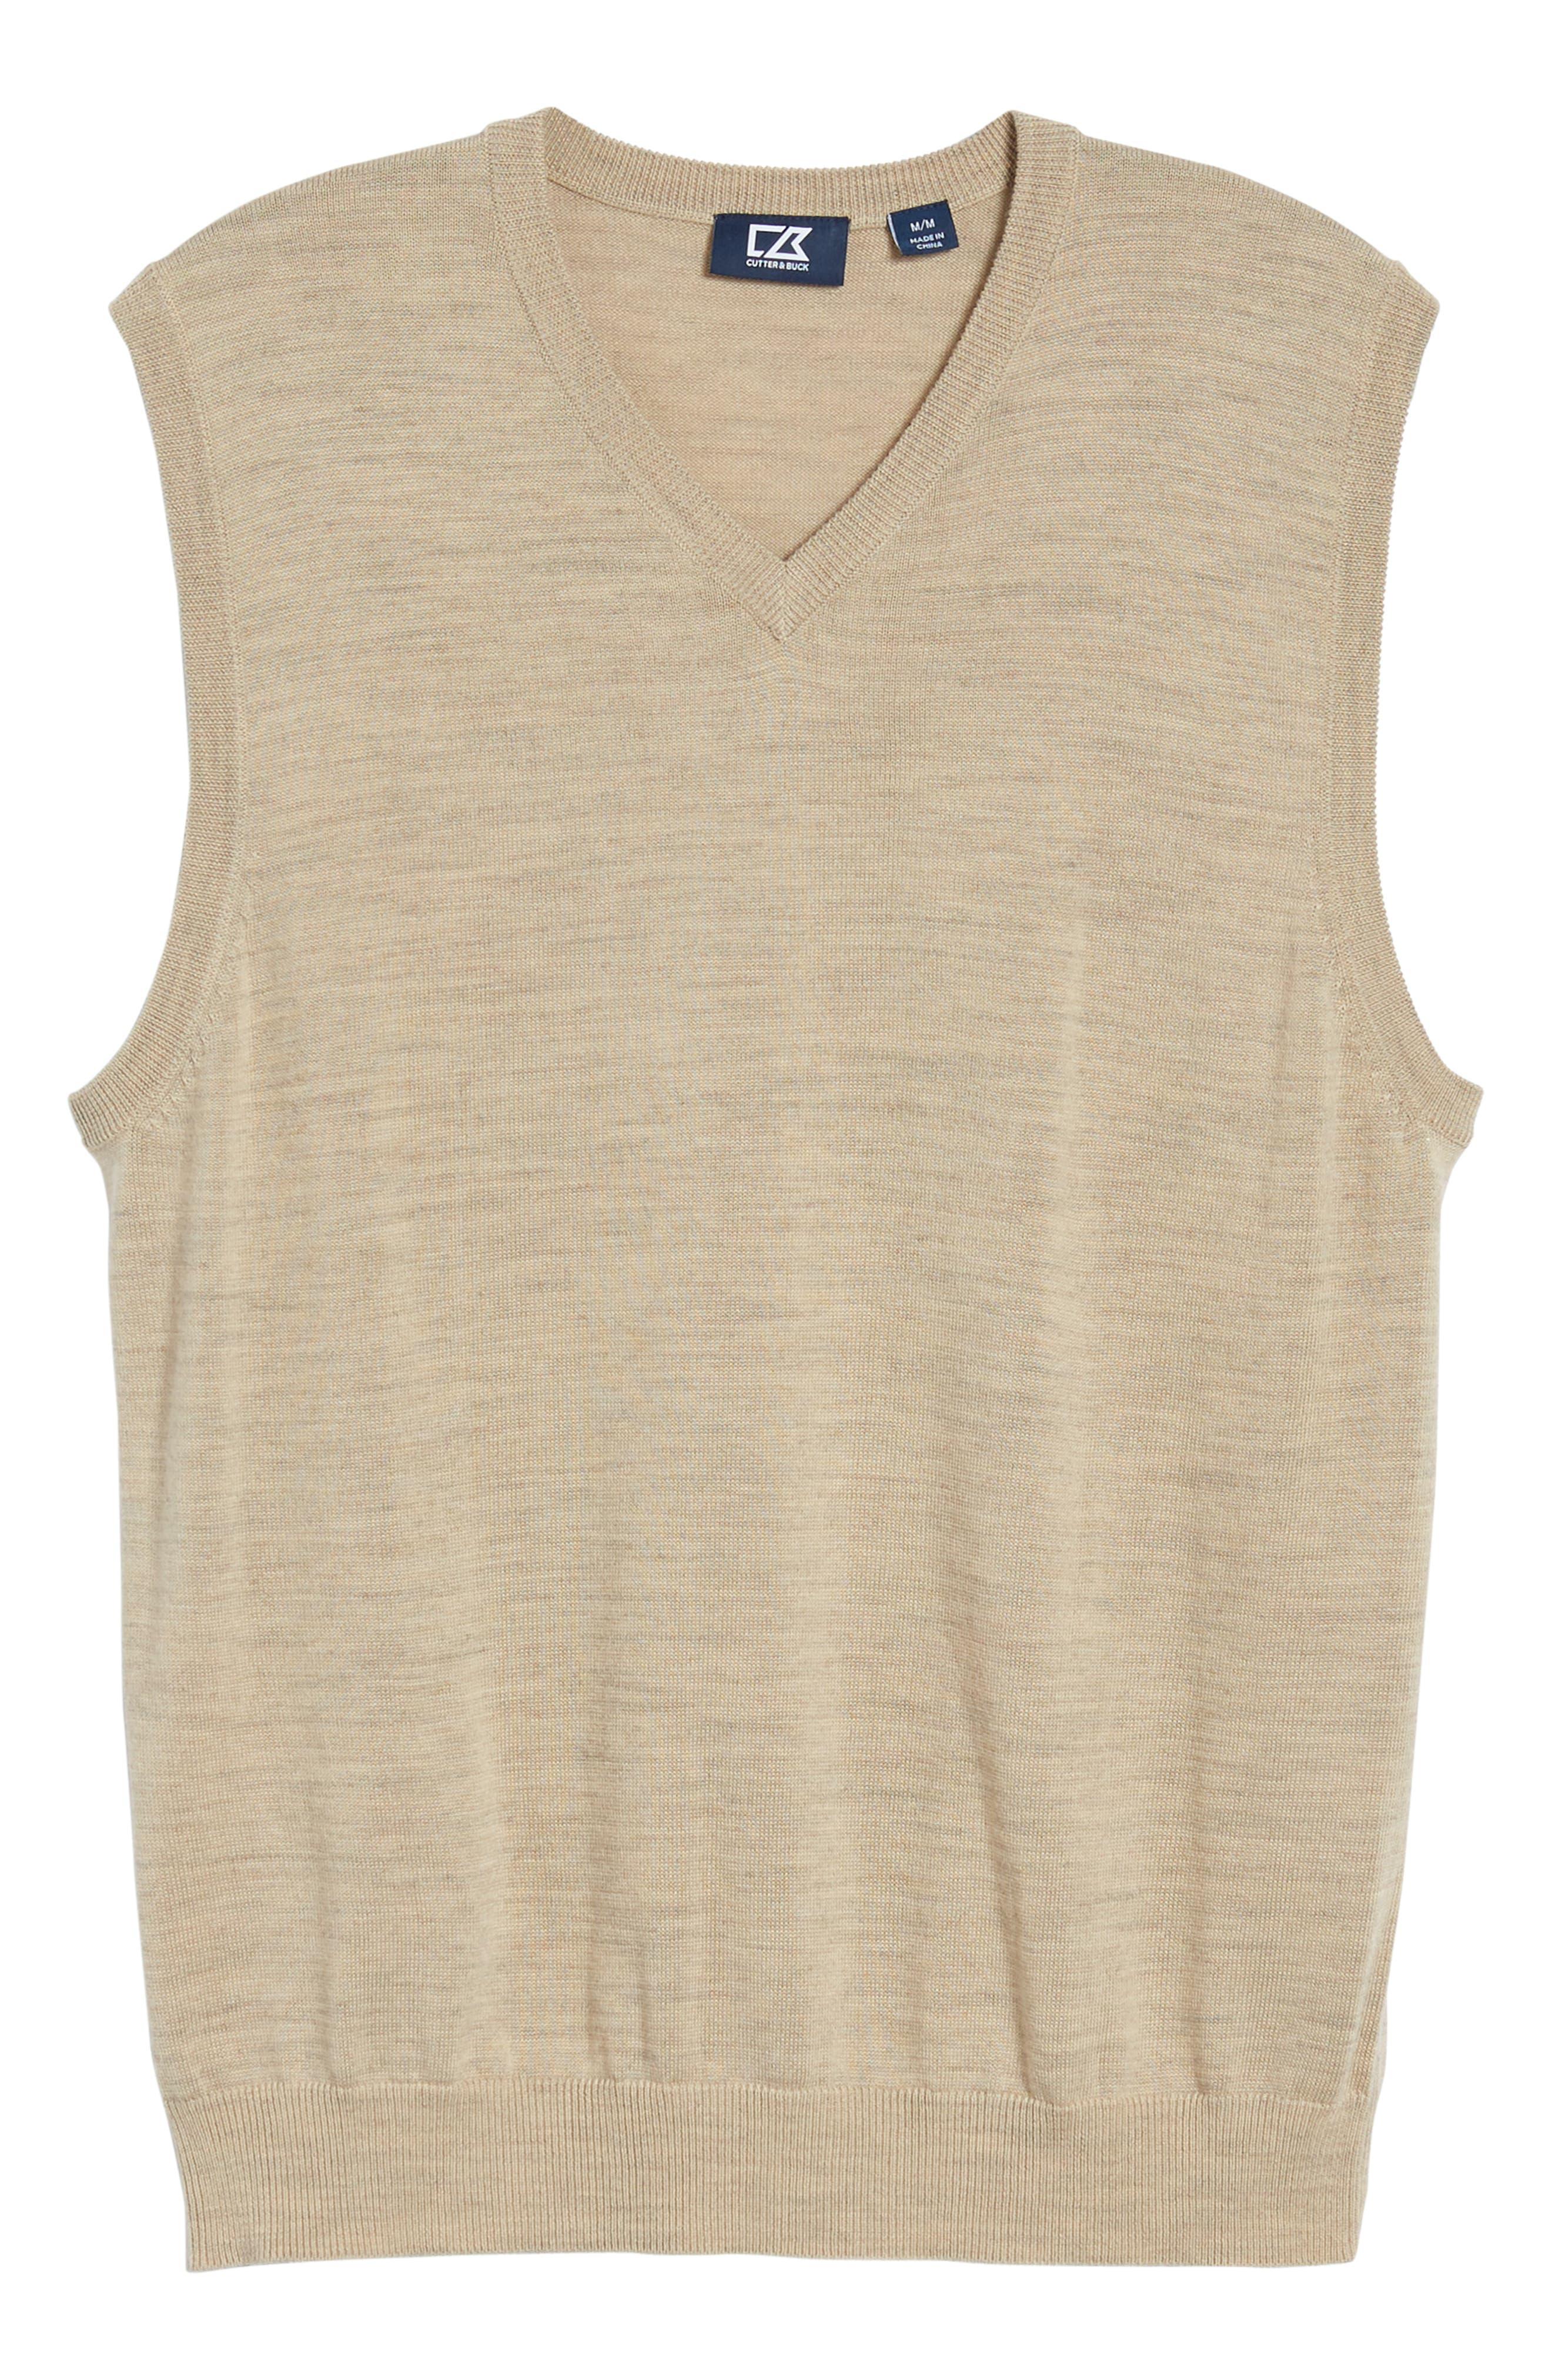 CUTTER & BUCK, 'Douglas' Merino Wool Blend V-Neck Sweater Vest, Alternate thumbnail 6, color, SAND HEATHER